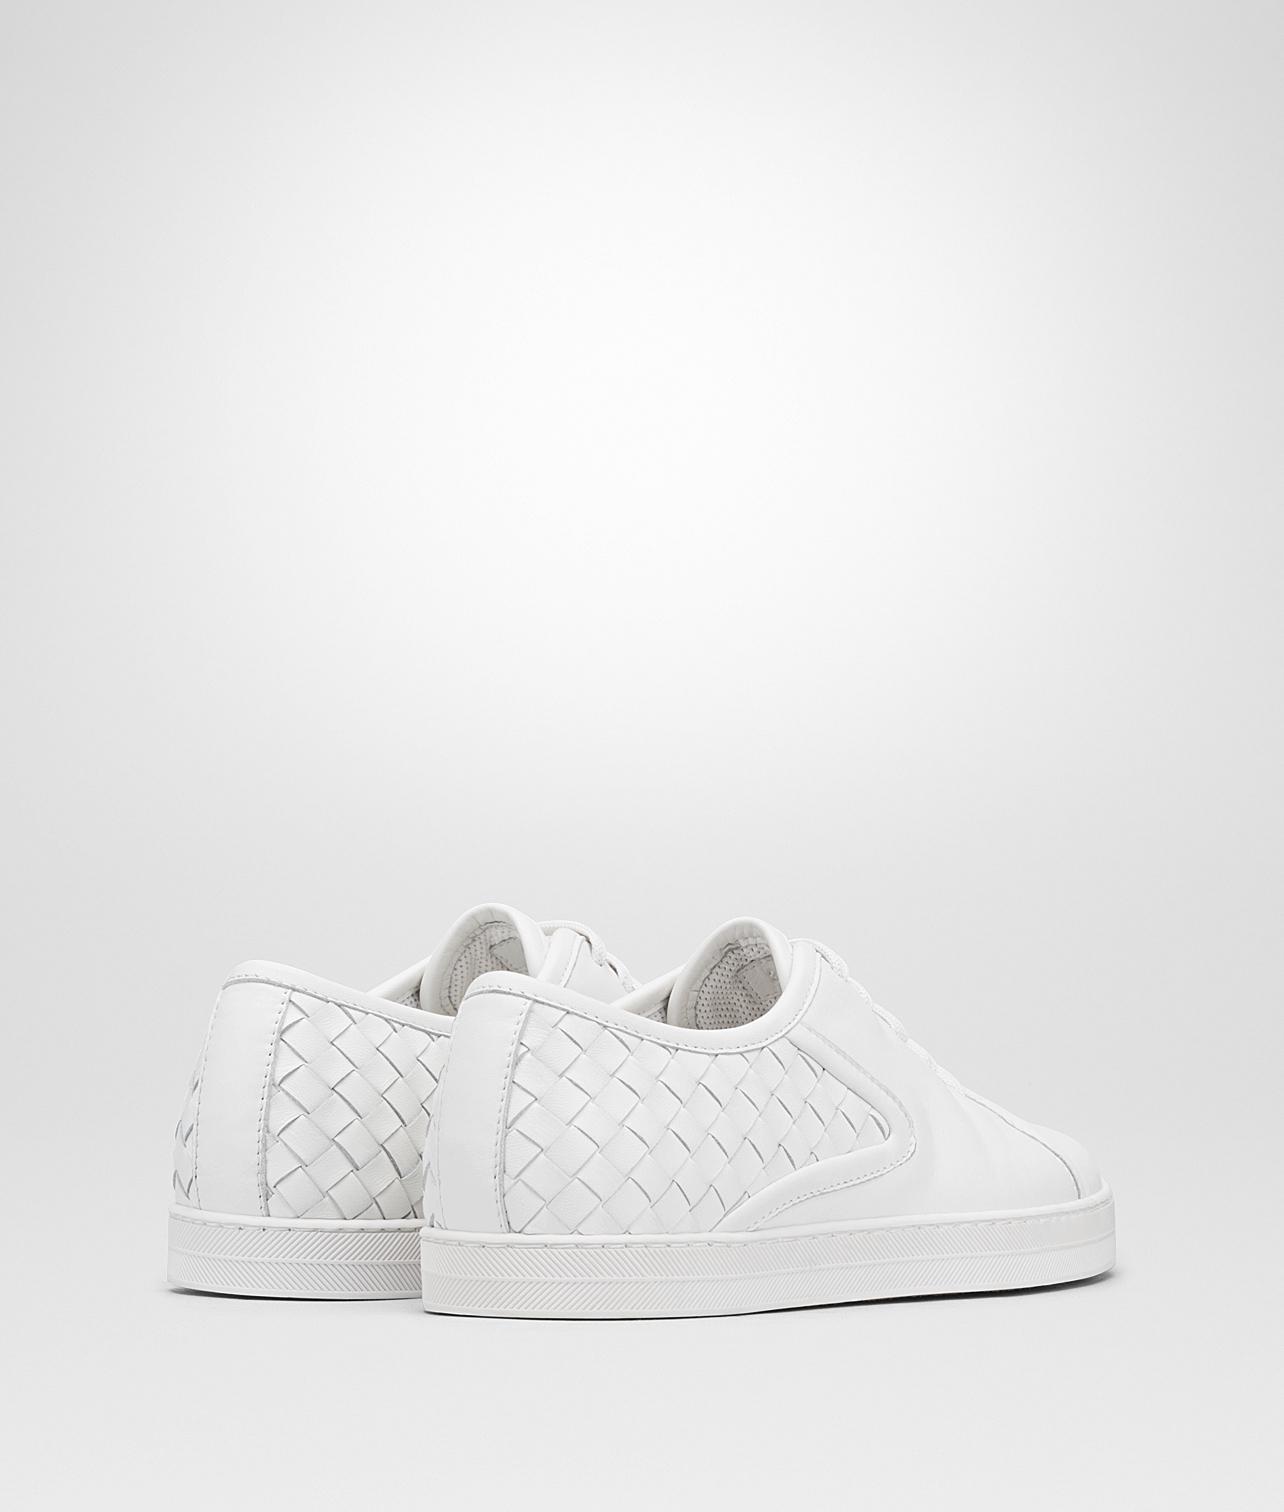 bianco Intrecciato nappa caramel sneaker - White Bottega Veneta SupAojq5